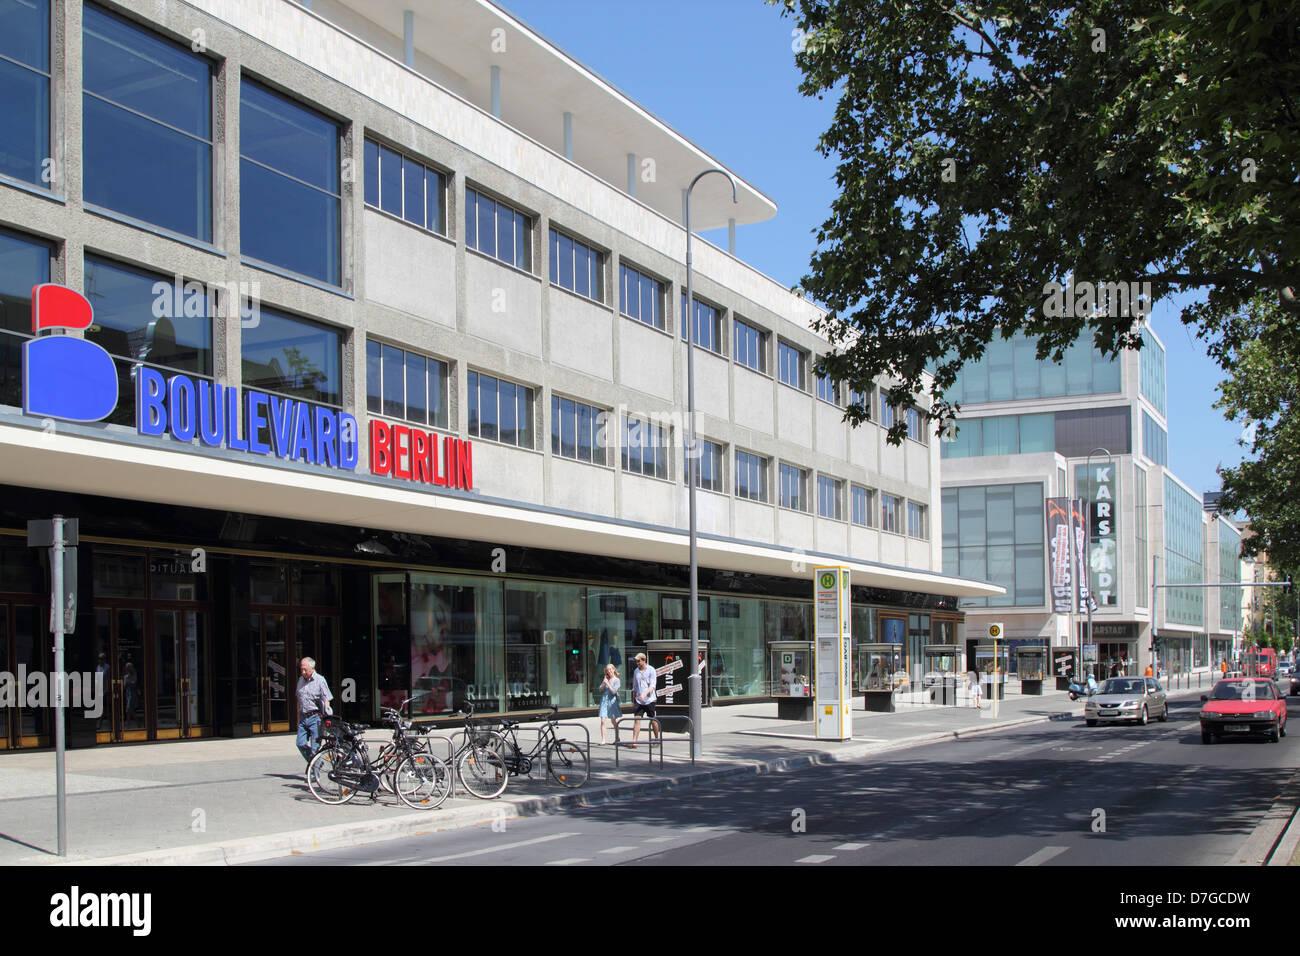 Berlin steglitz boulevard berlin shopping center stock image